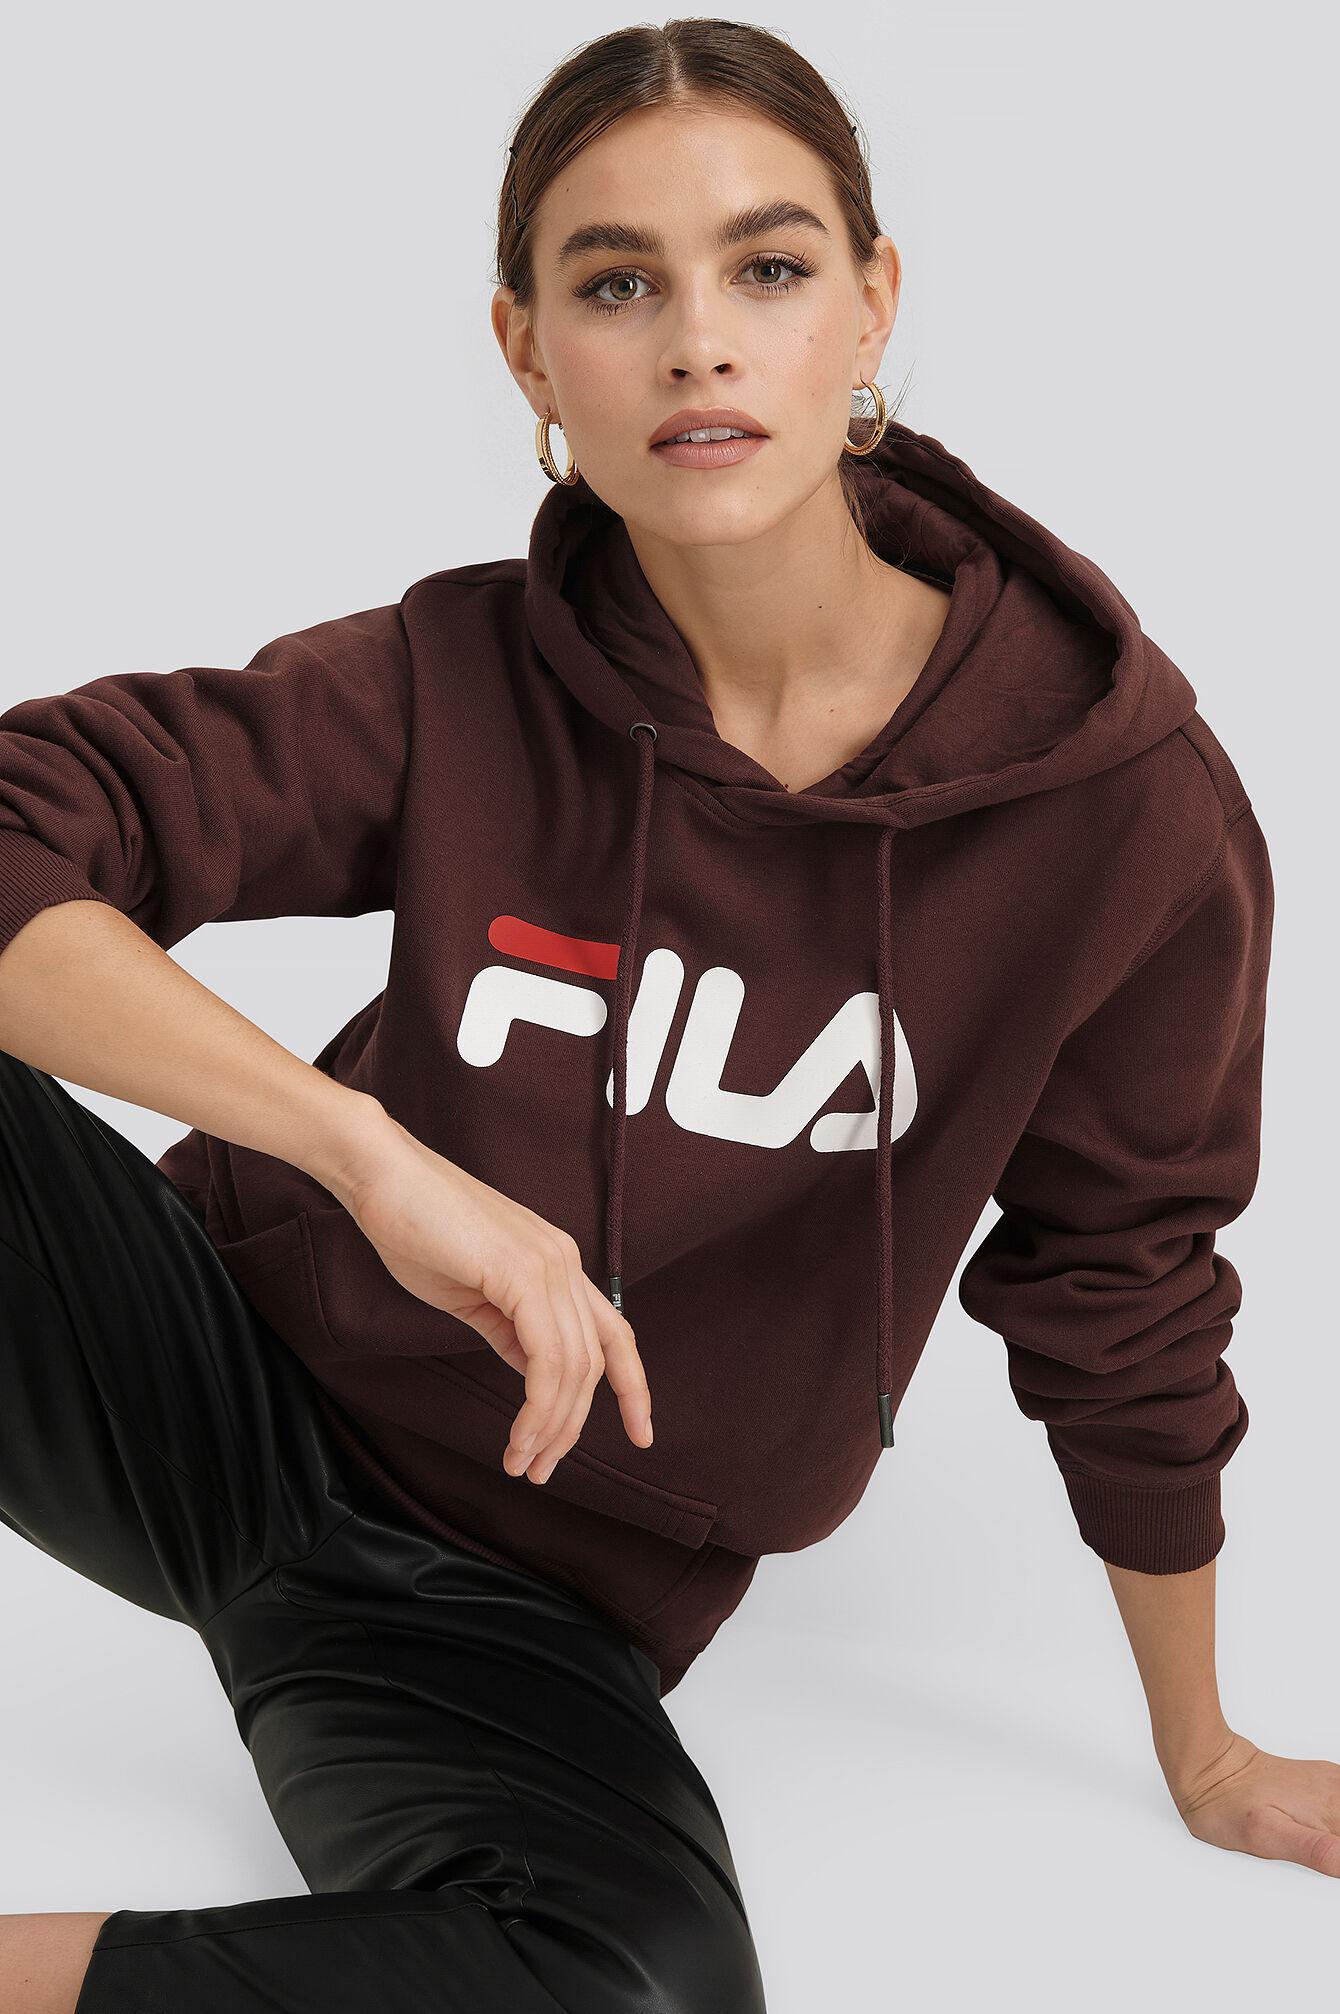 FILA Classic Pure Hoody Kangaroo - Brown  - Size: Small